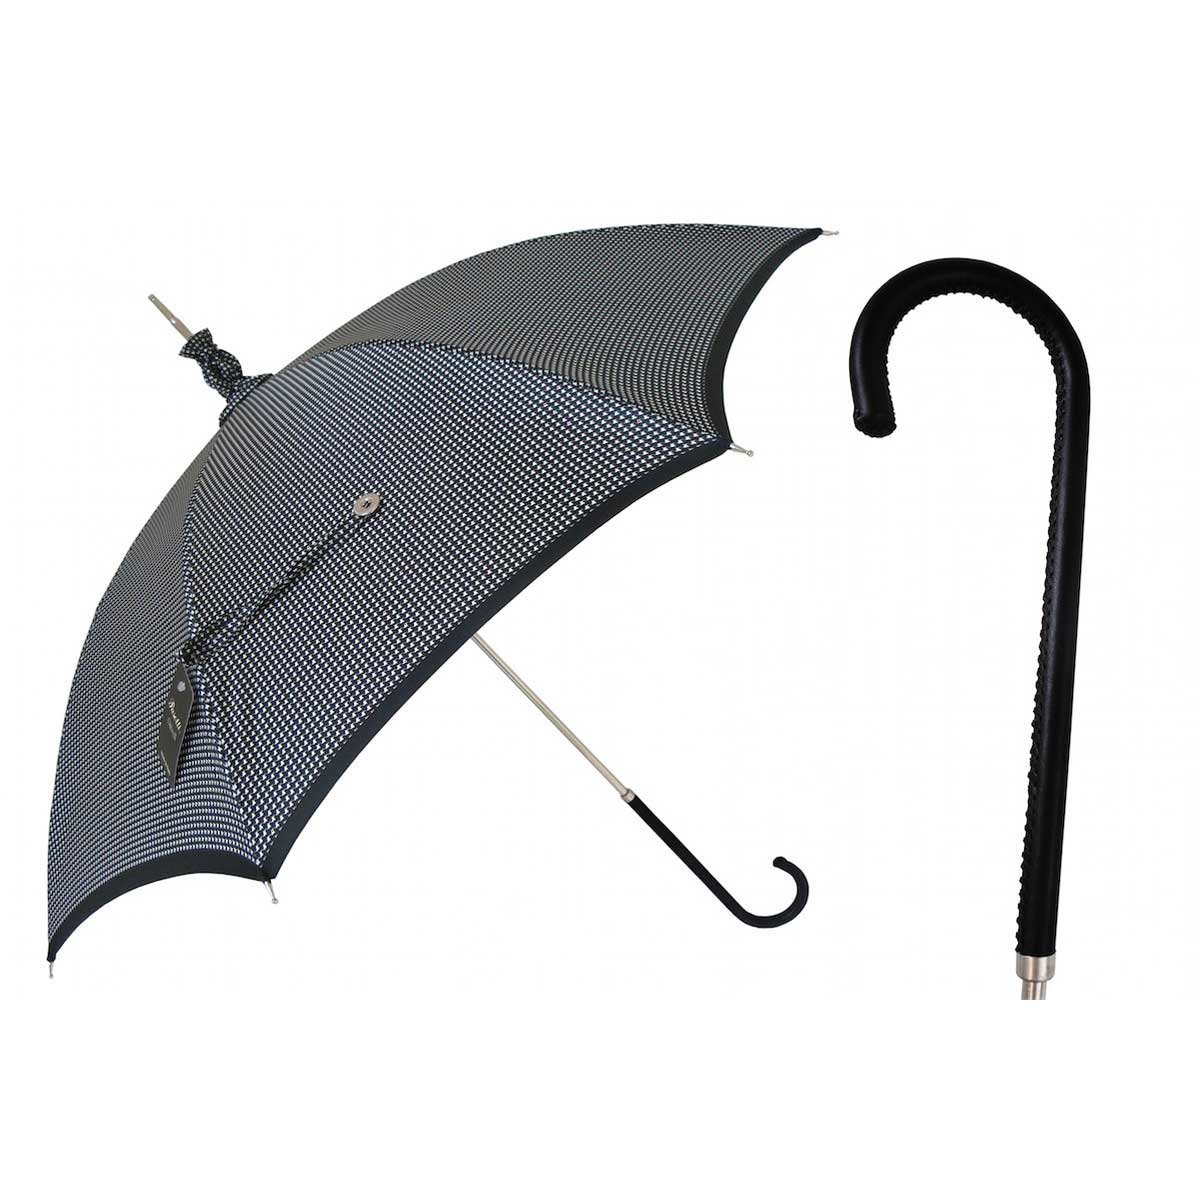 pasotti ombrelli pied de poule parasol women 39 s umbrella black leather handle. Black Bedroom Furniture Sets. Home Design Ideas